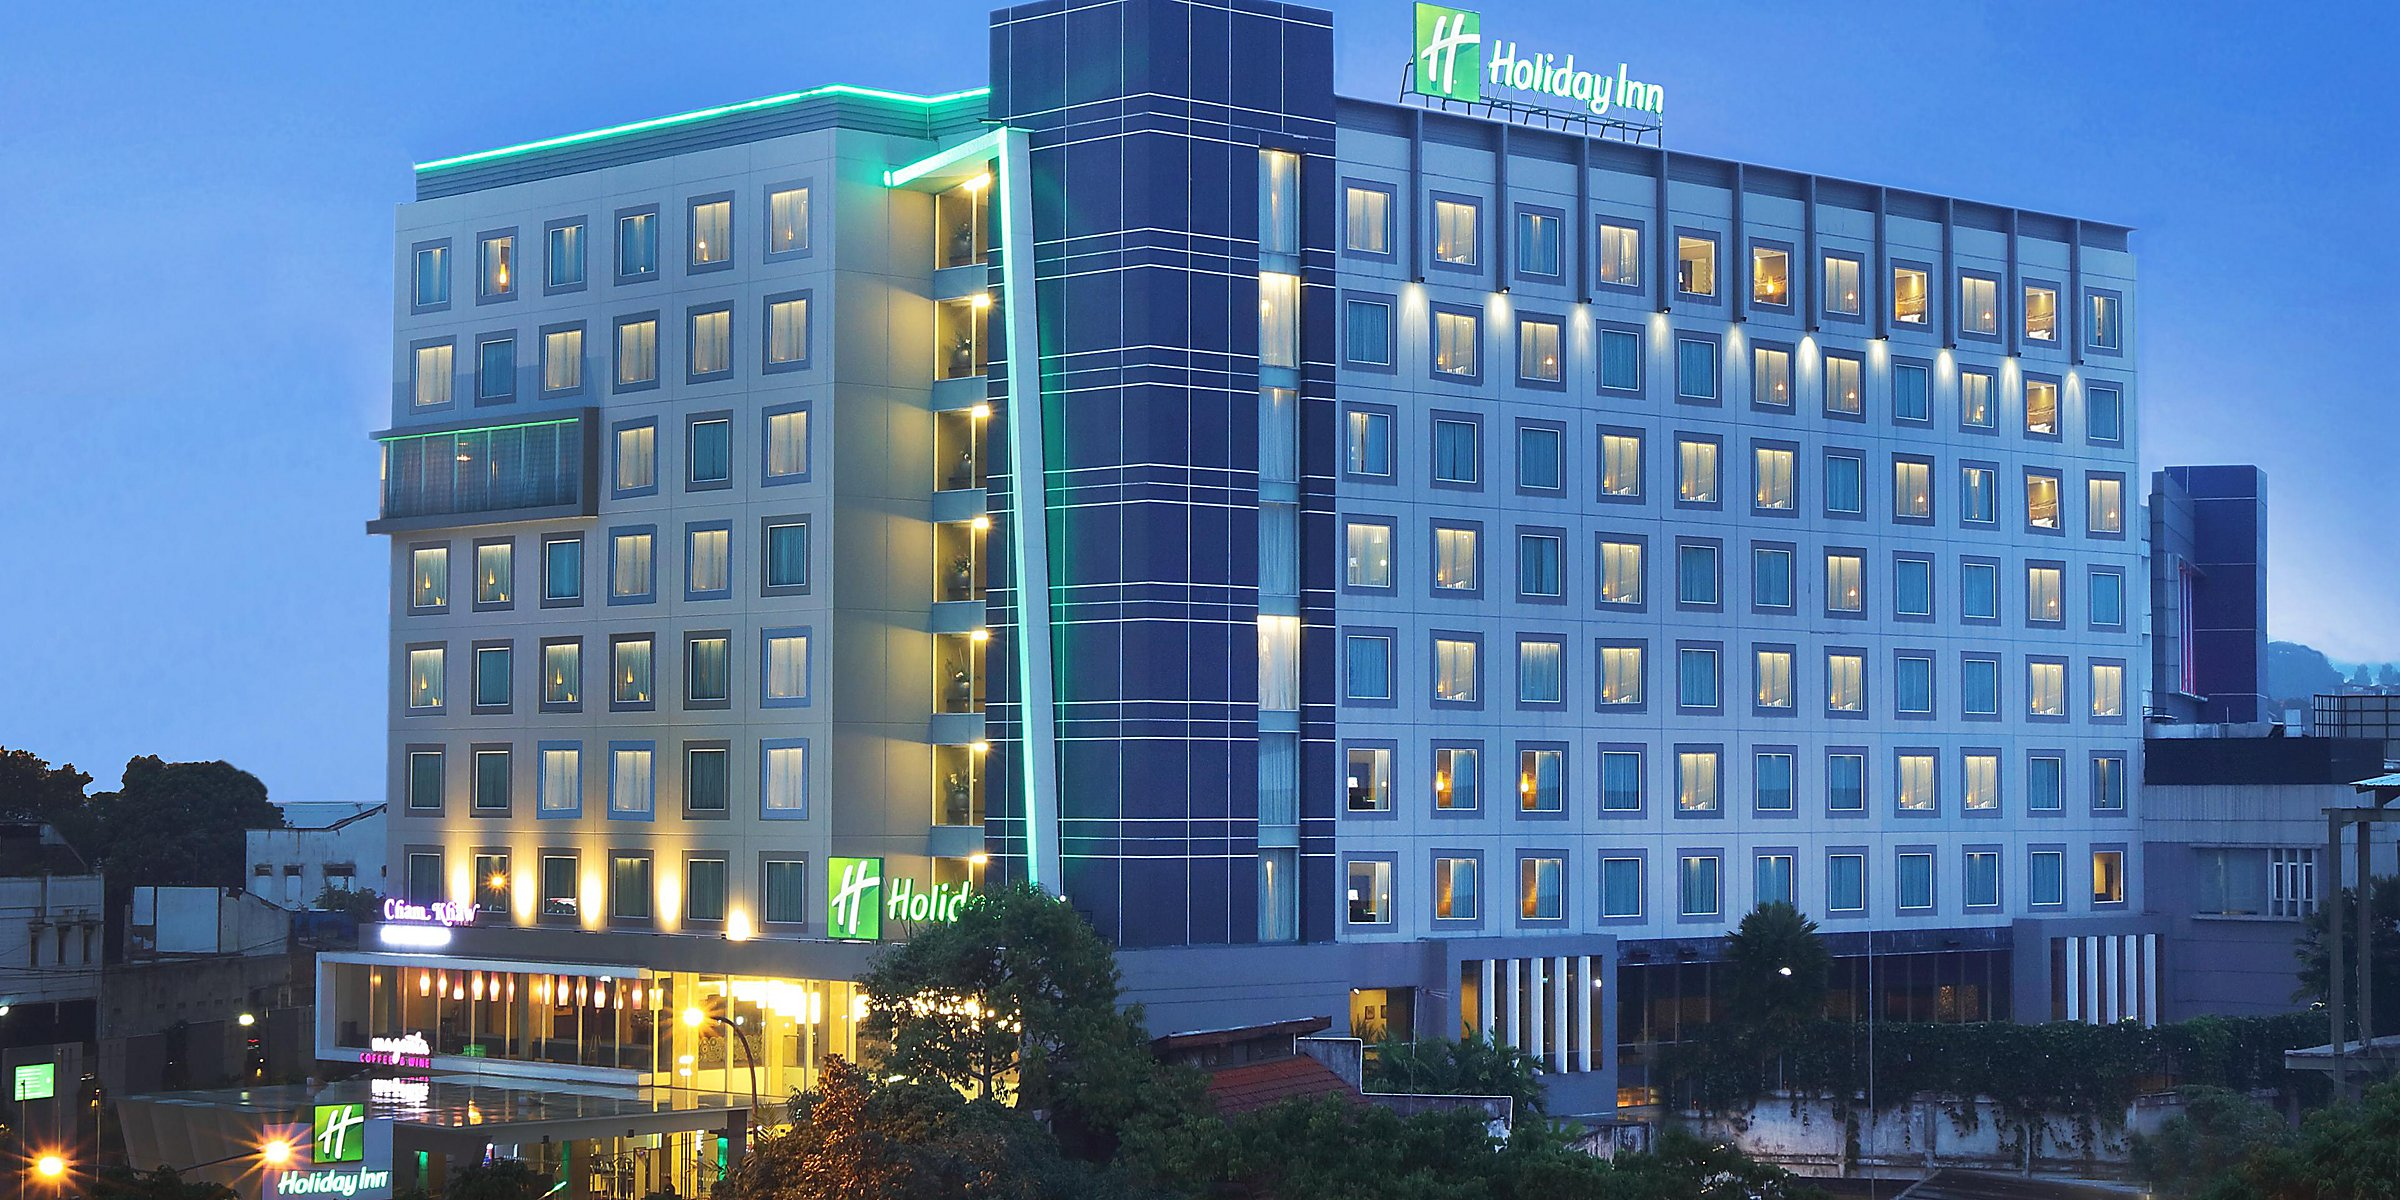 btc hotel bandung review